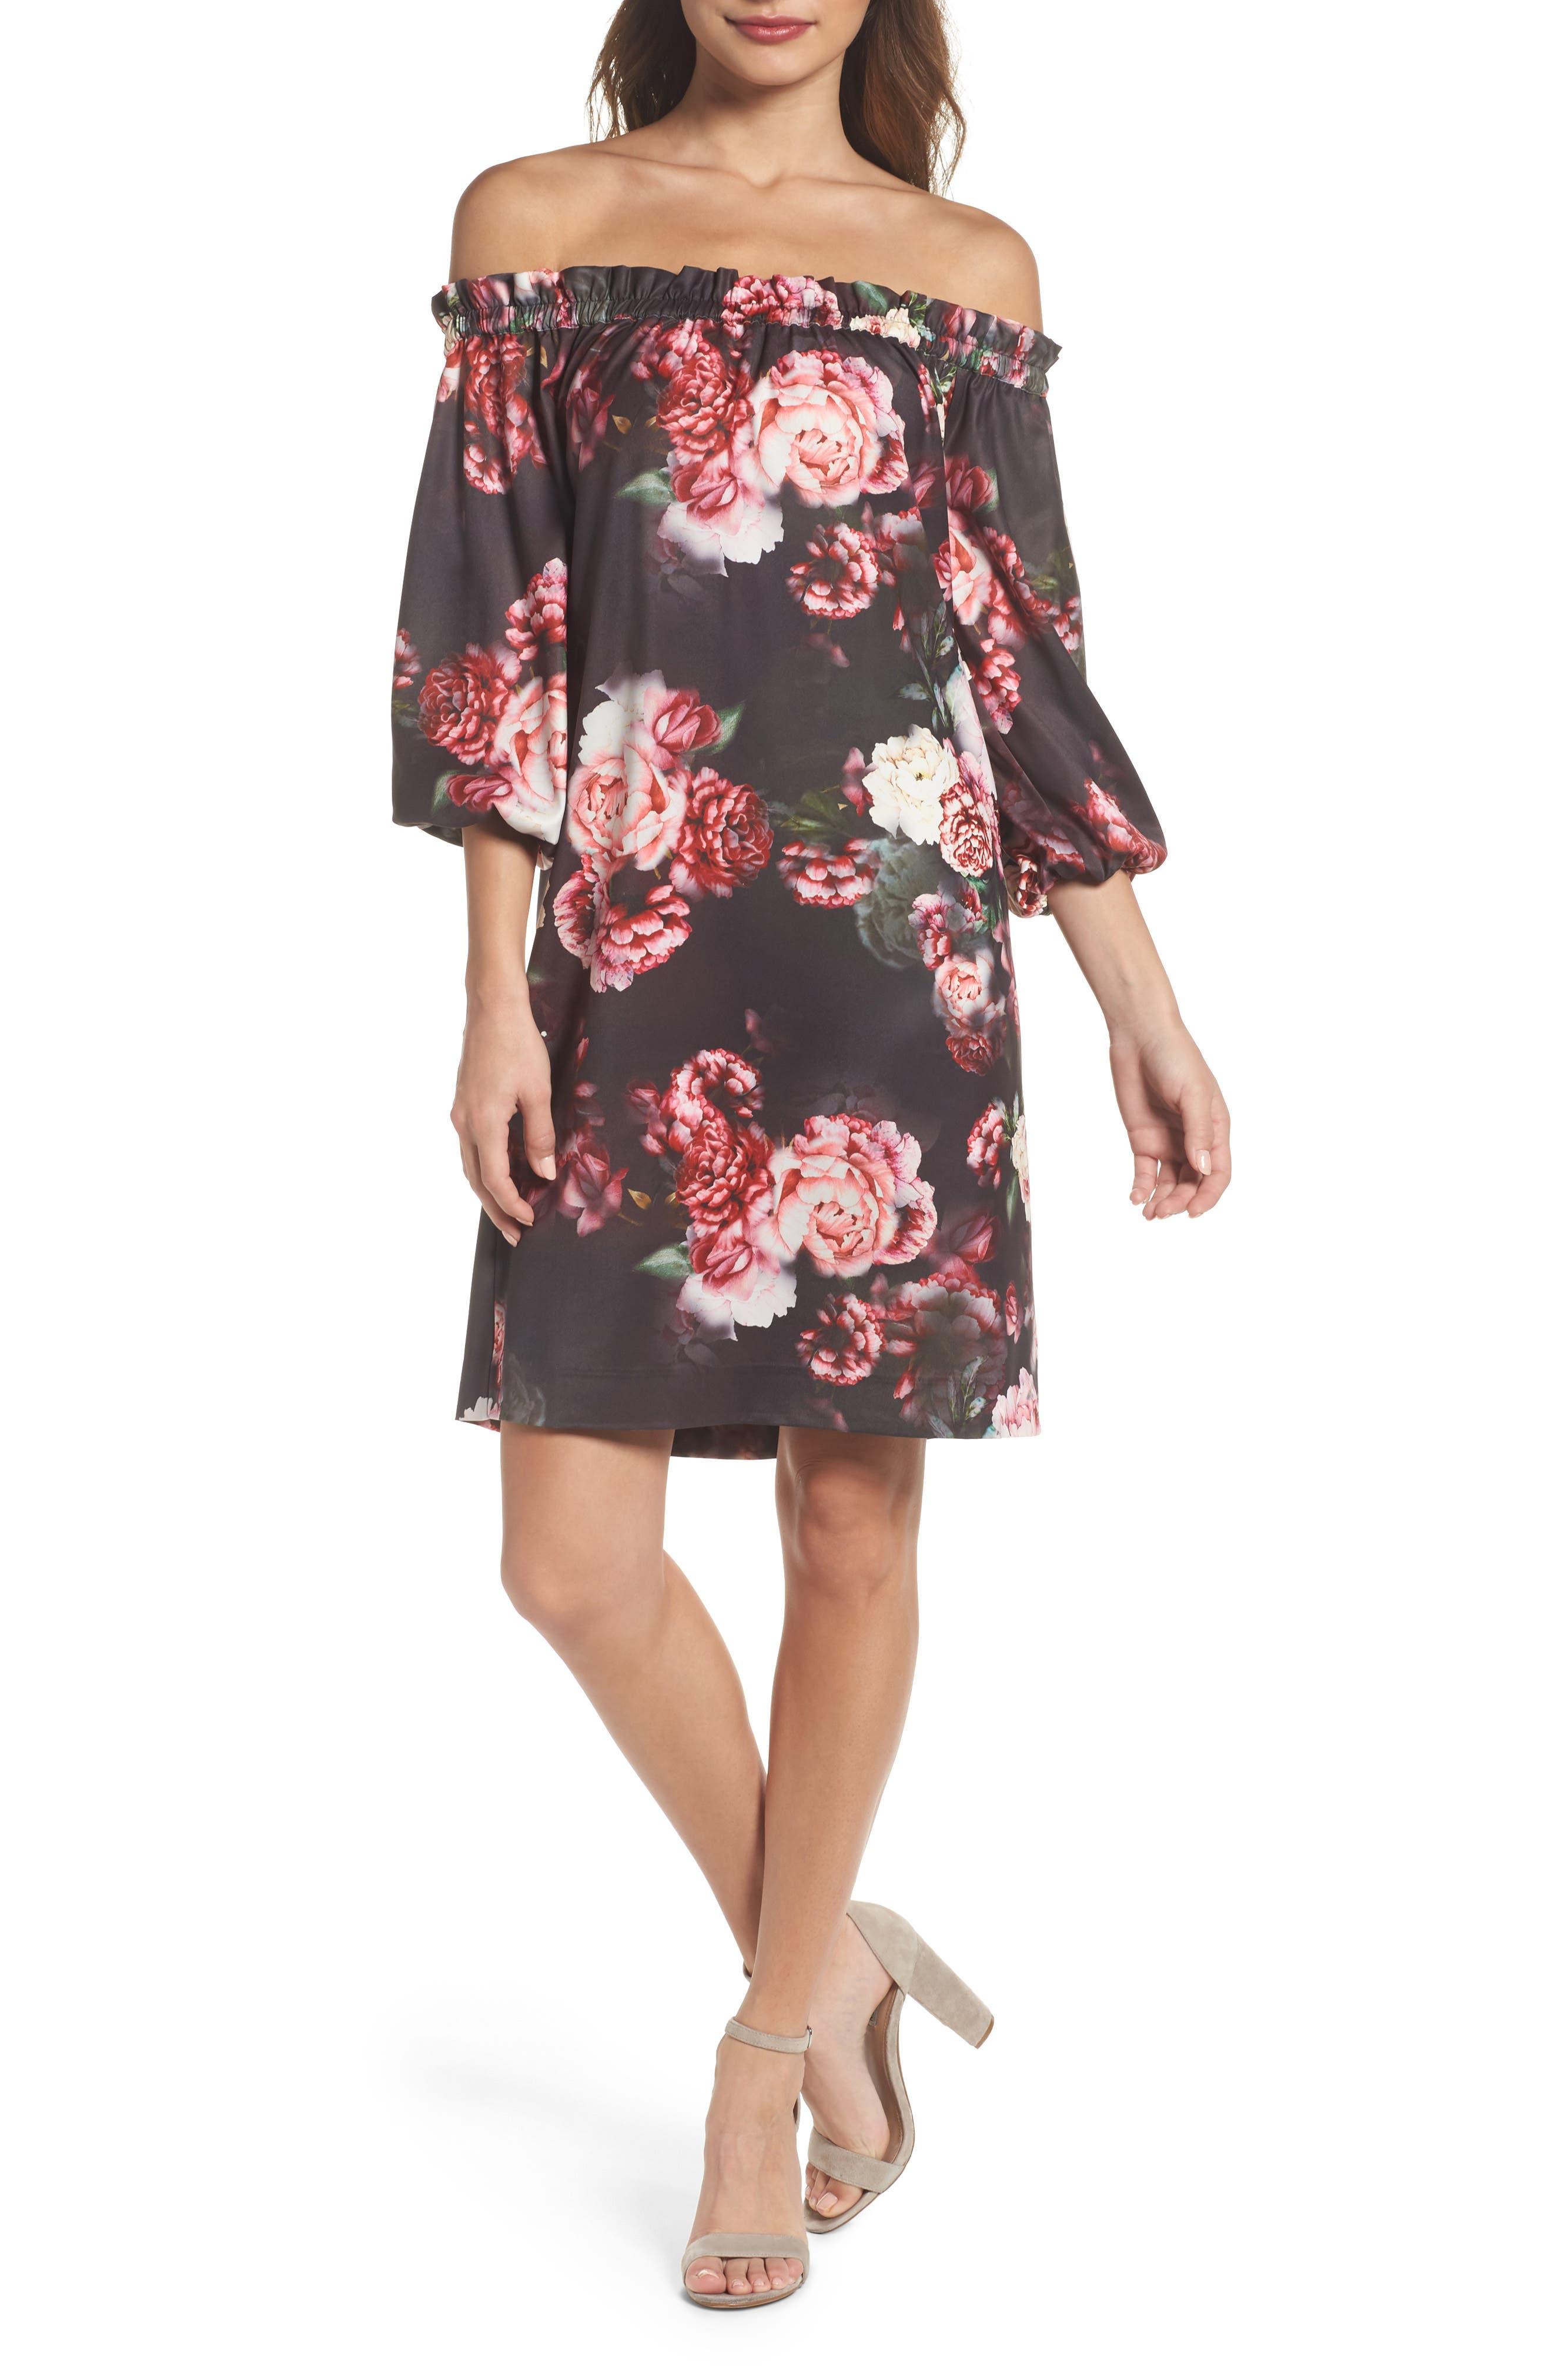 Main Image - Felicity & Coco Print Off the Shoulder Shift Dress (Regular & Petite) (Nordstrom Exclusive)